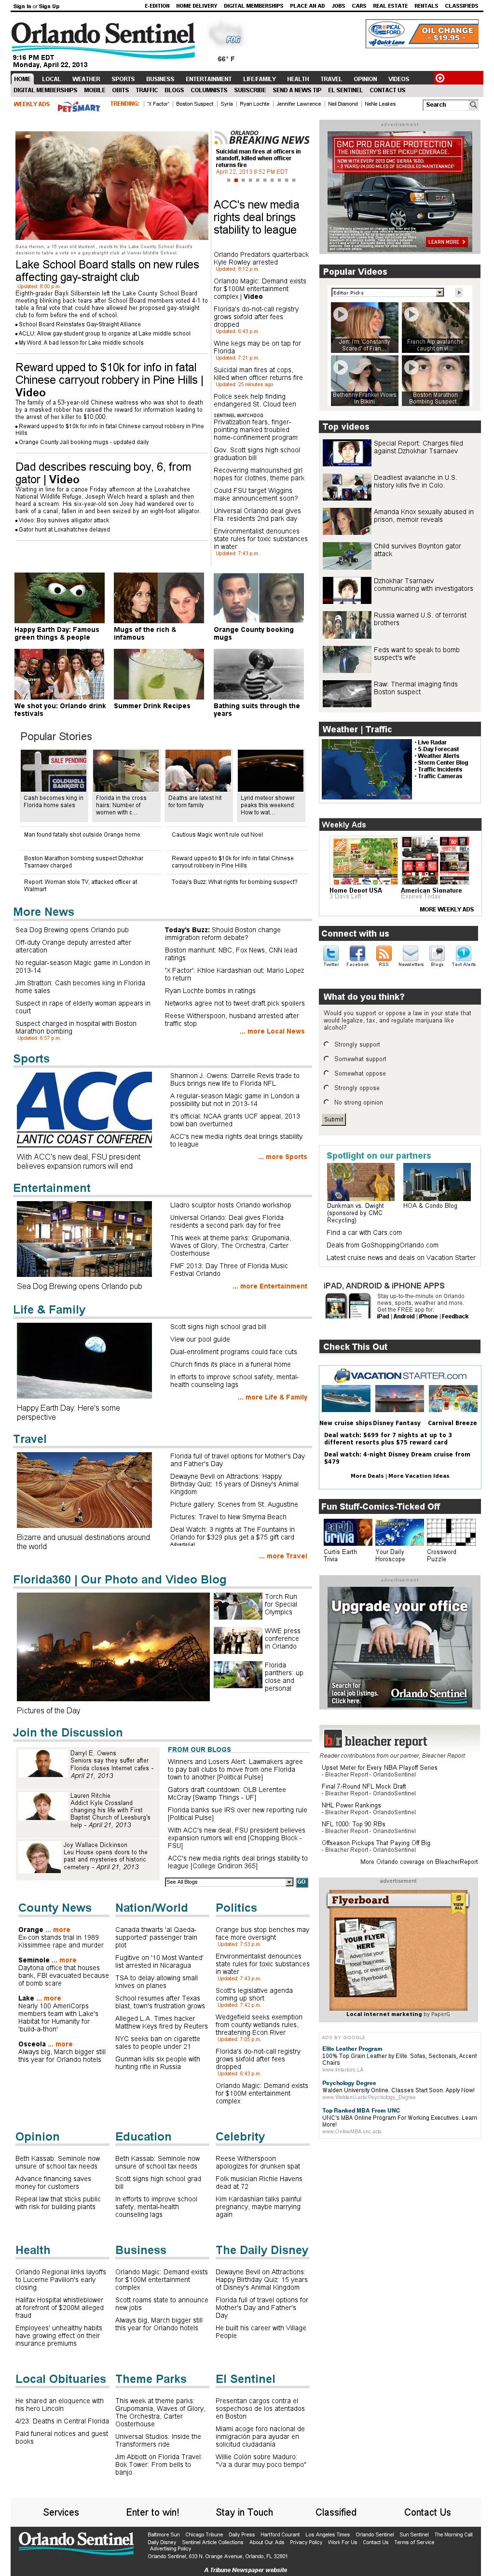 Orlando Sentinel at Tuesday April 23, 2013, 1:17 a.m. UTC